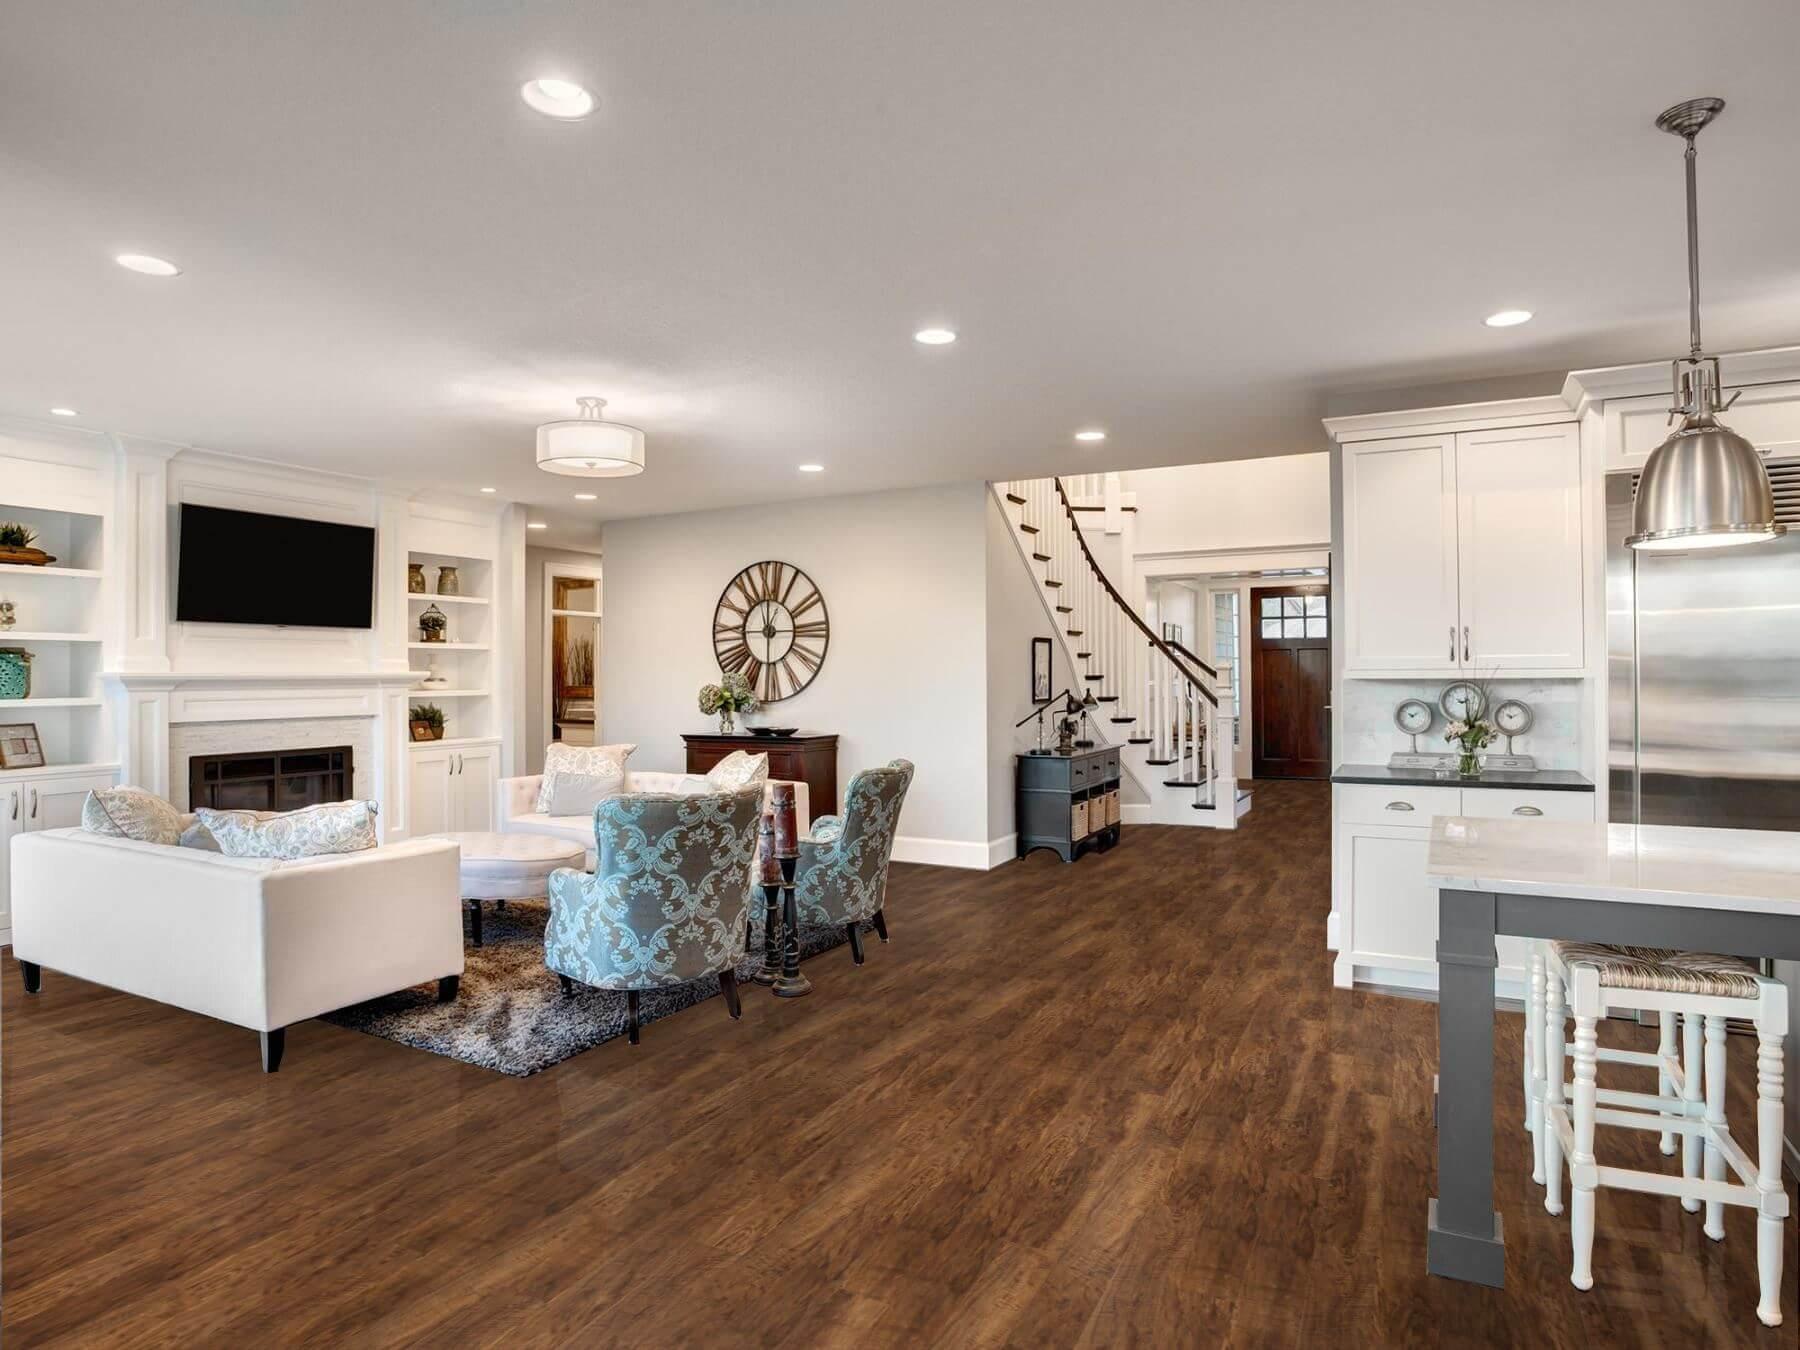 hardwood floor company kansas city of earthwerks flooring with regard to earthwerks room visualizer